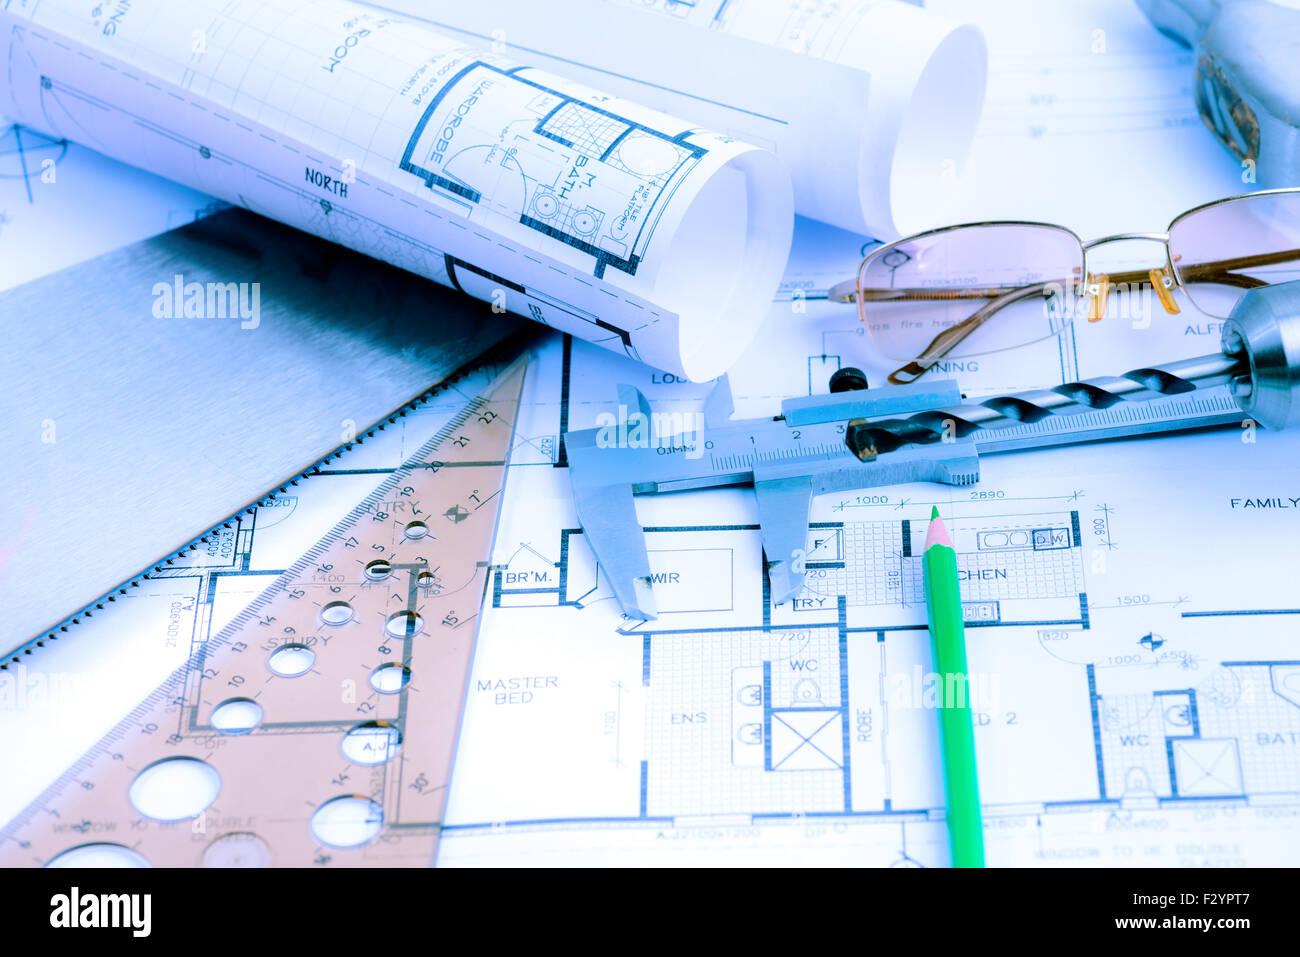 Gli schemi architetturali rotoli ed elementi di ingegneria. Tonica in blu Immagini Stock